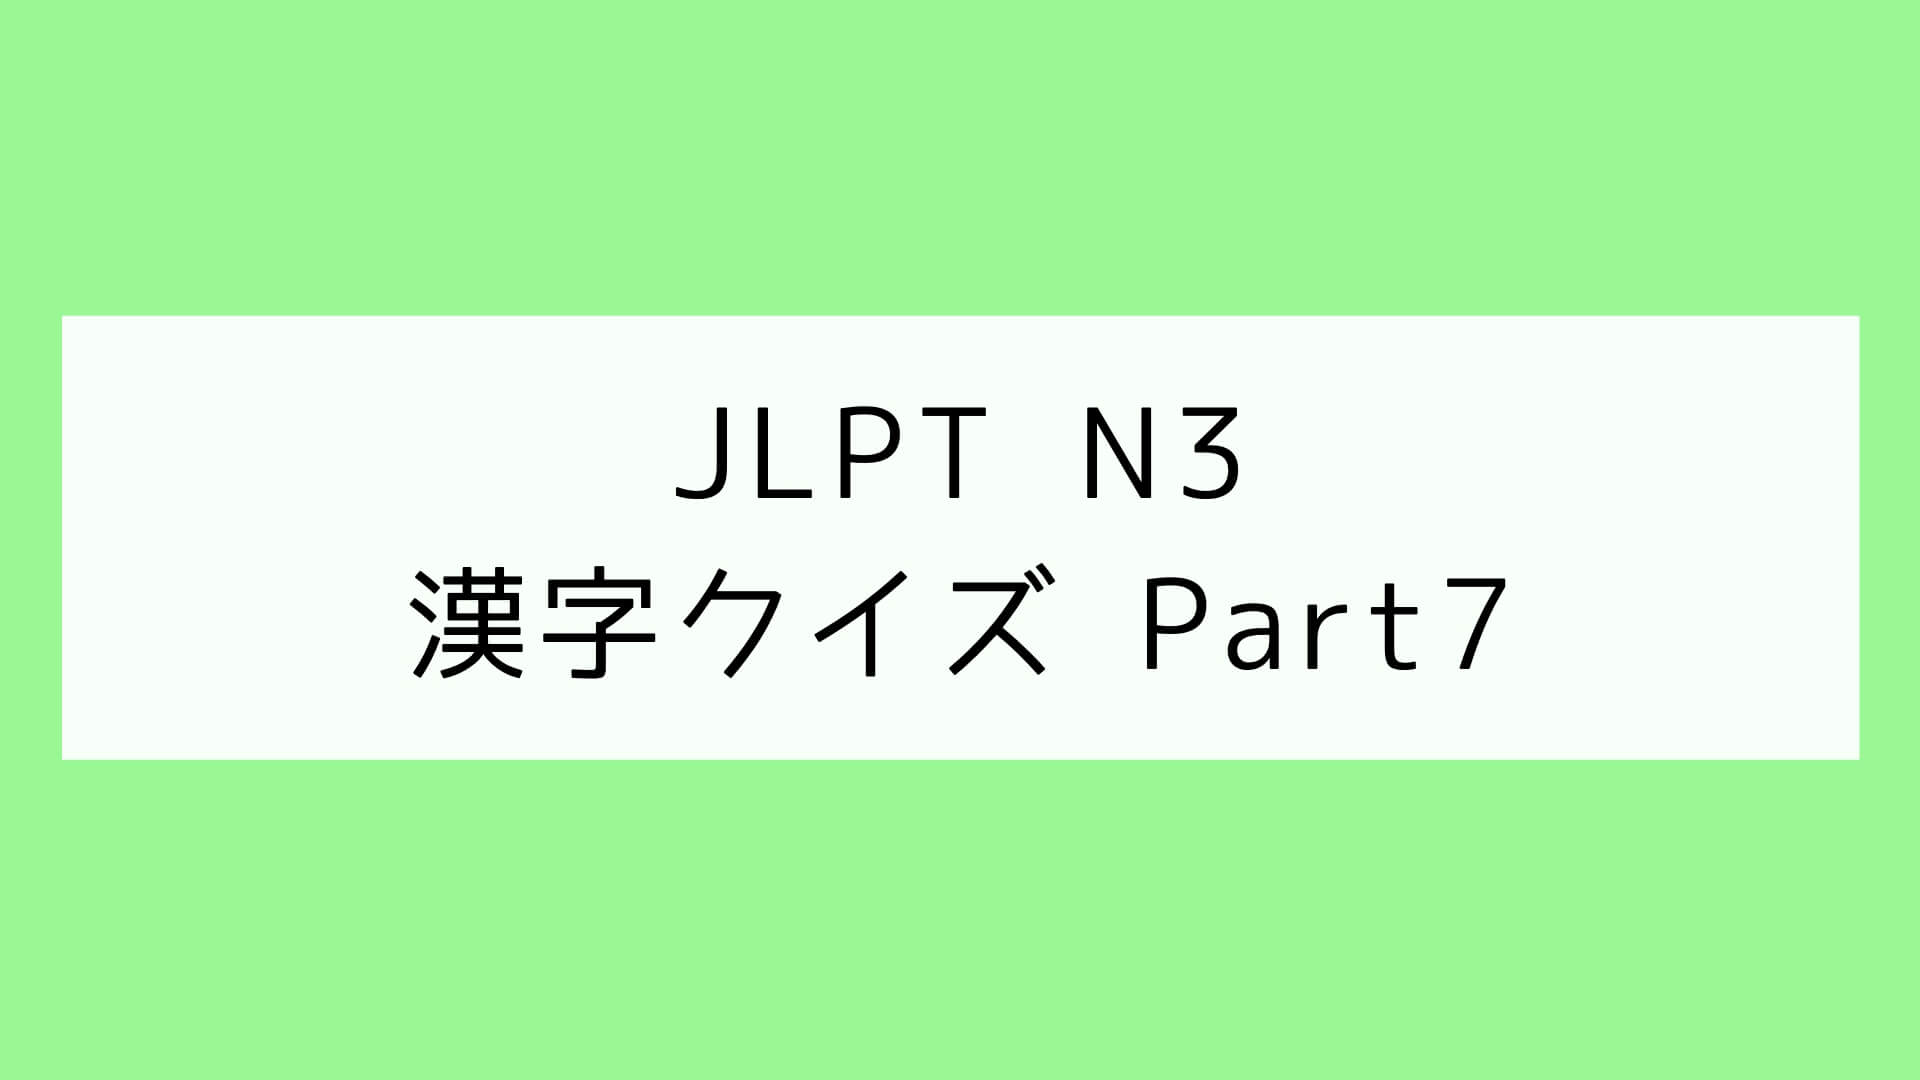 【JLPT N3】漢字クイズ Part7